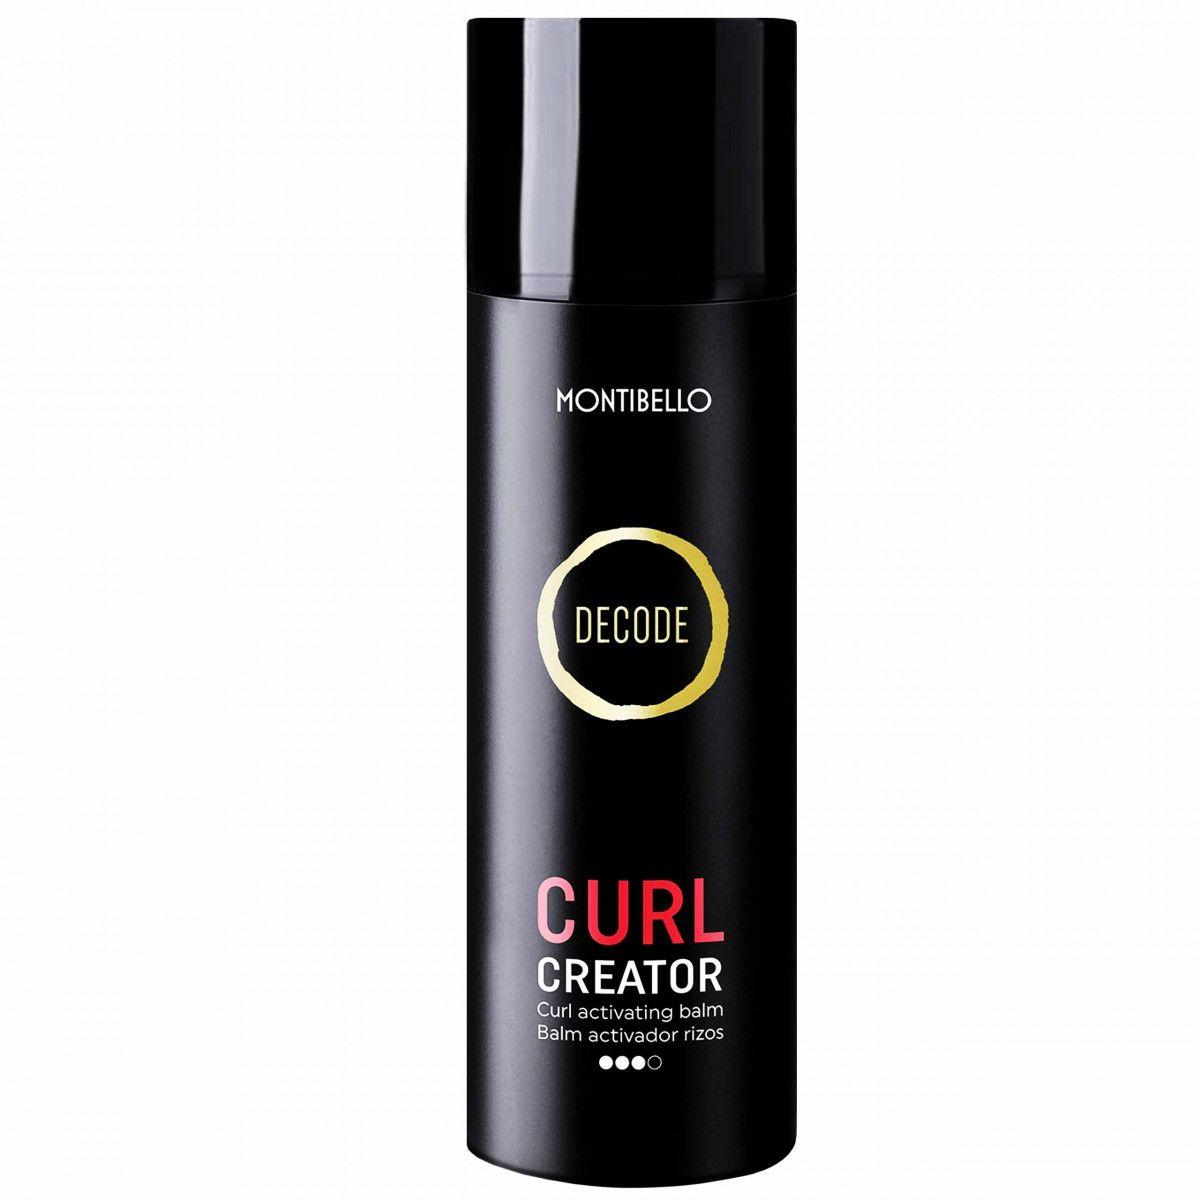 Montibello Curl Creator mocny termoochronny krem do loków, zapobiega puszeniu 150ml